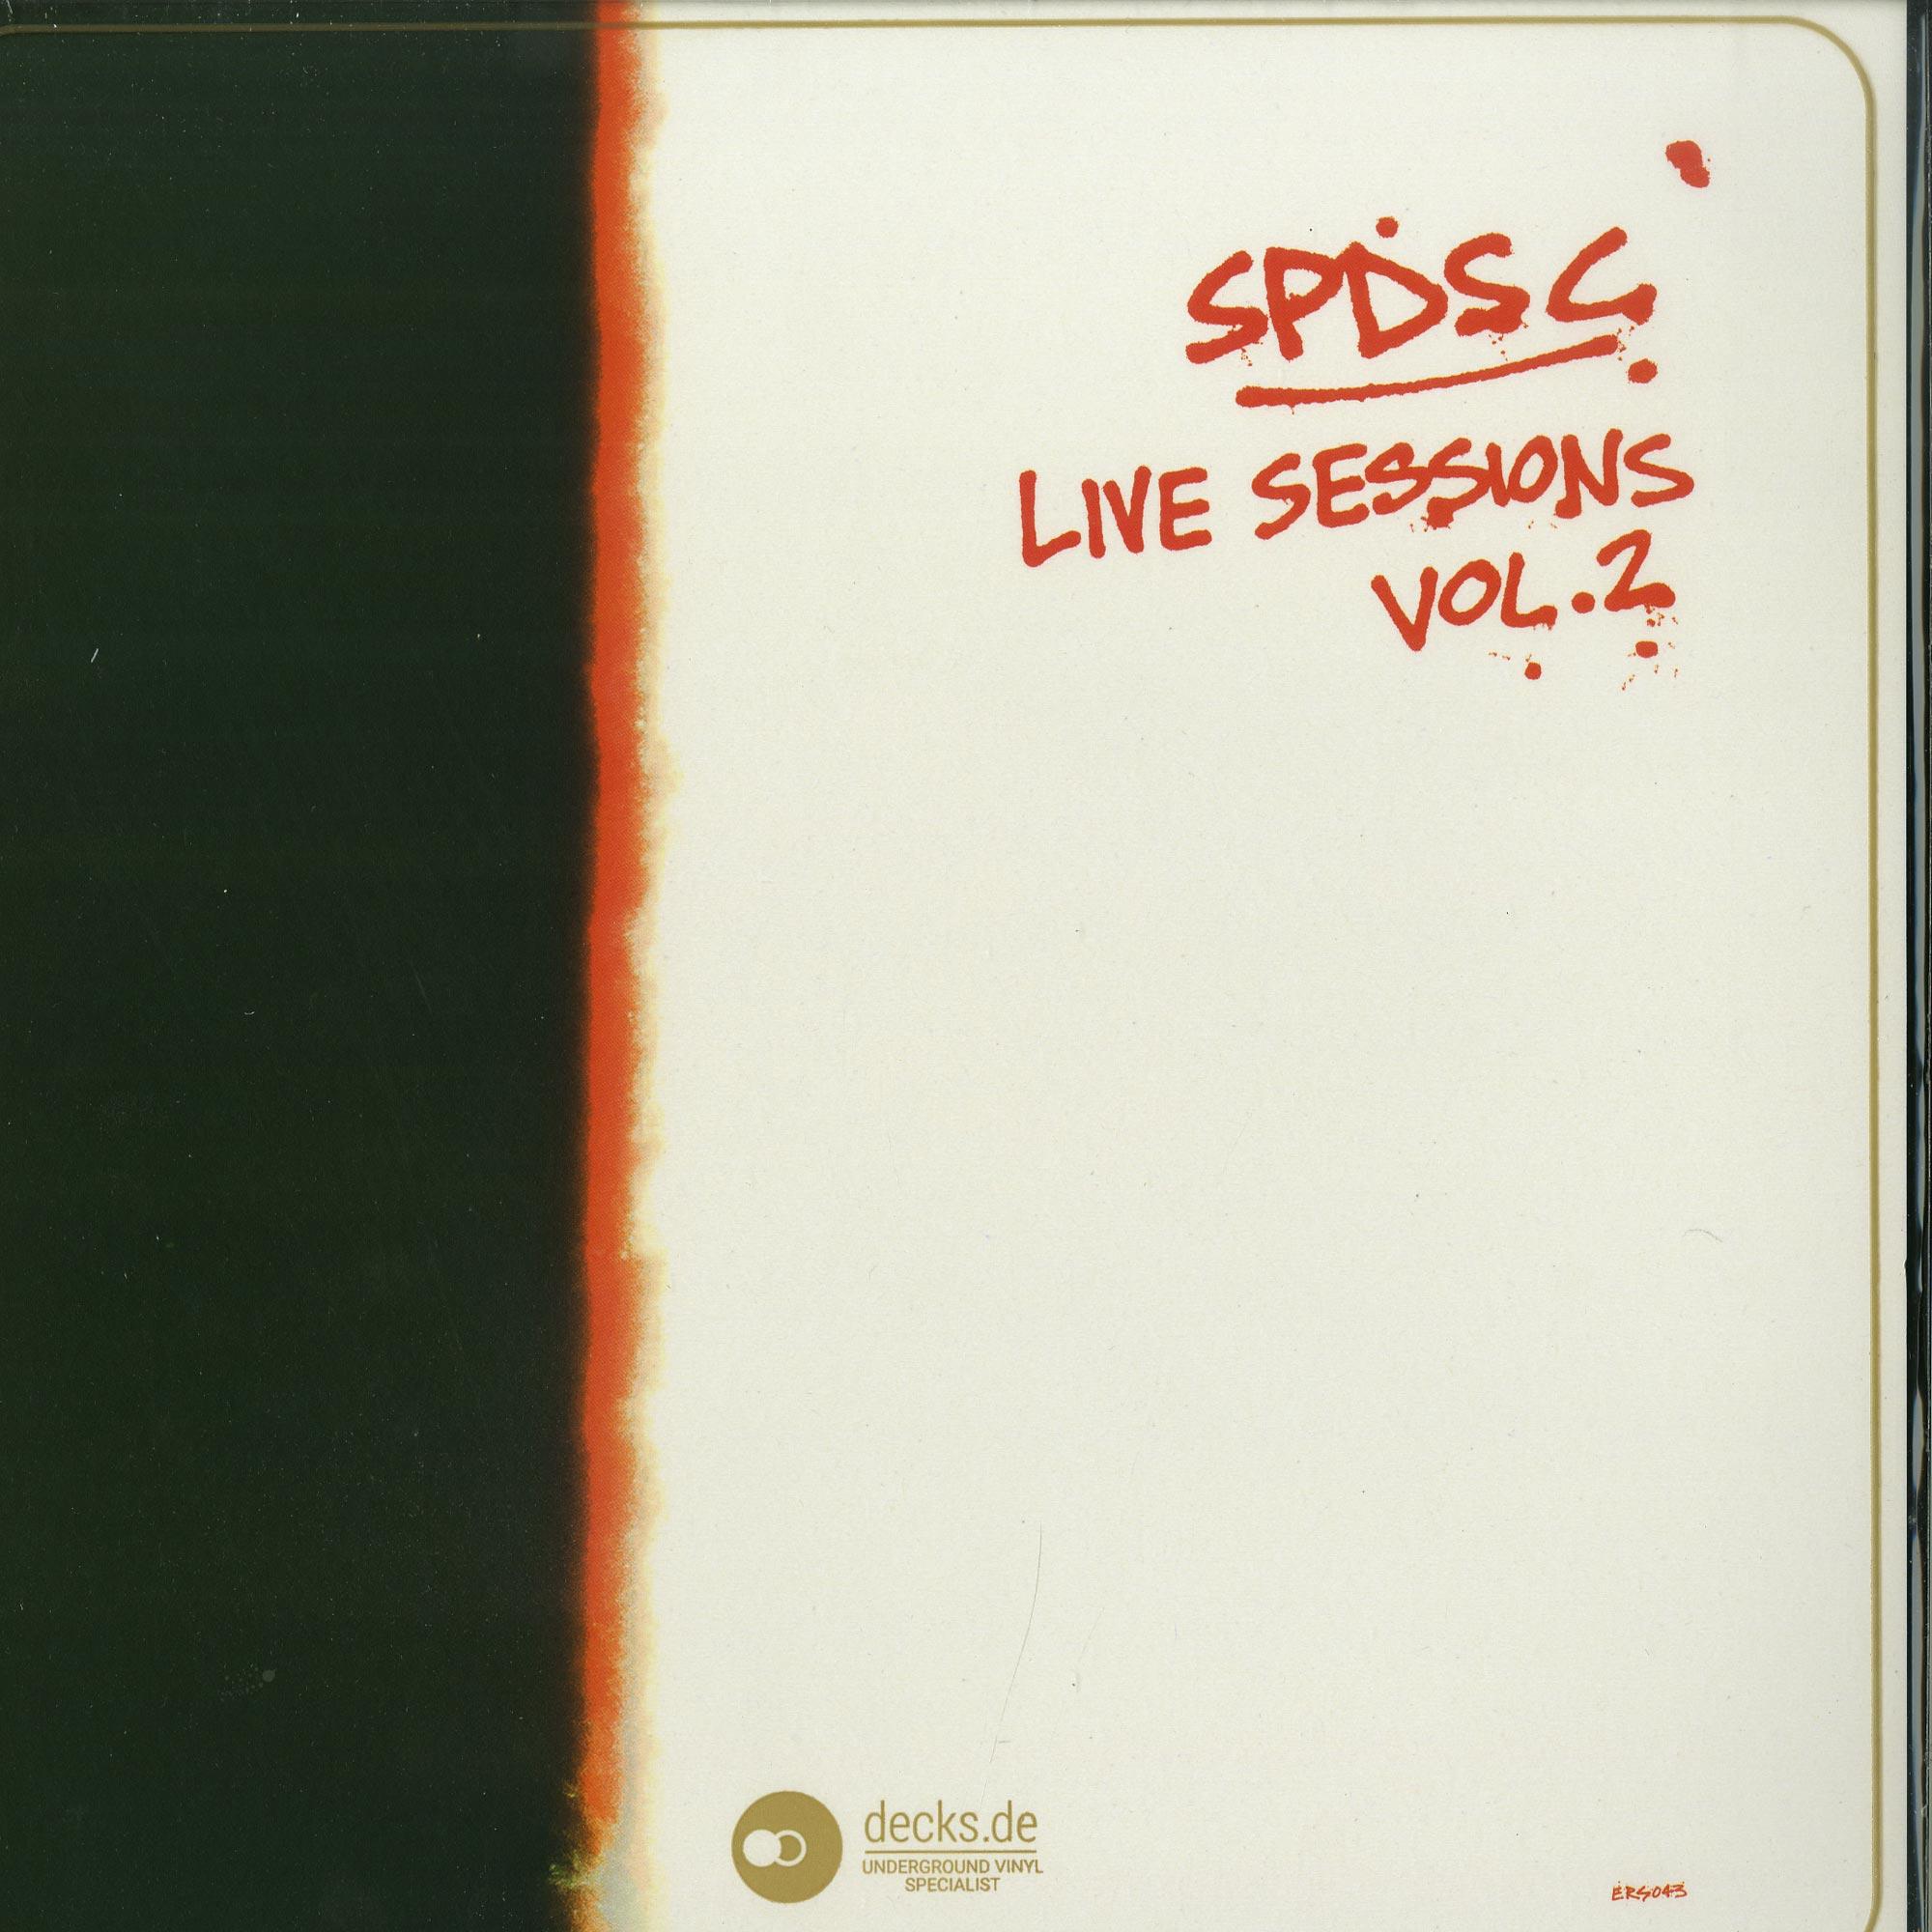 Saint Petersburg Disco Spin Club - LIVE SESSIONS VOL.2